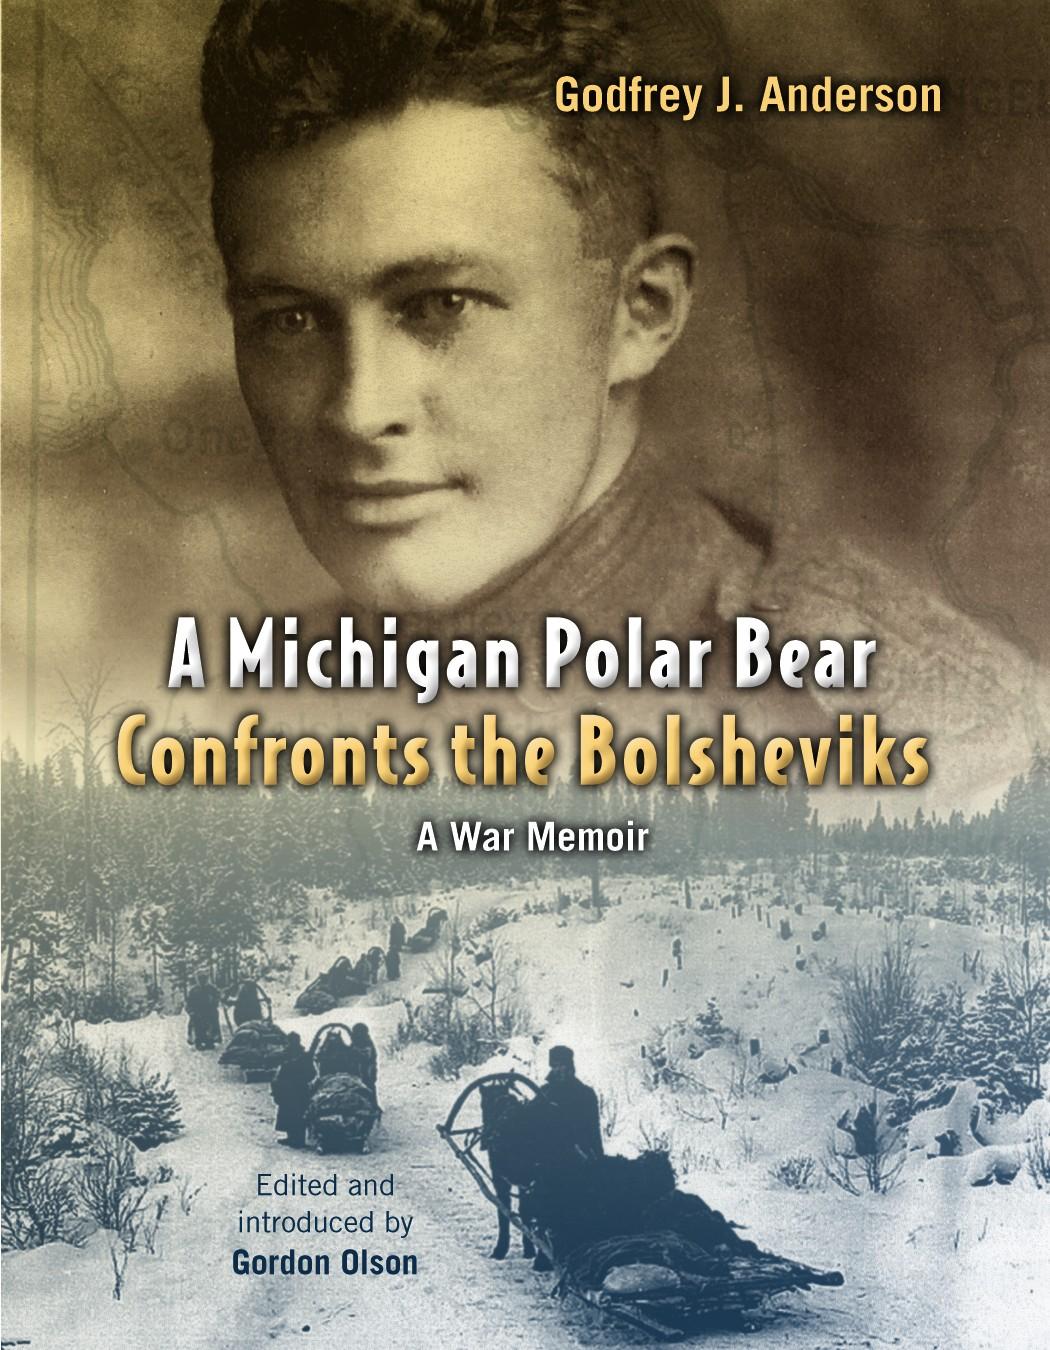 A Michigan Polar Bear Confronts the Bolsheviks